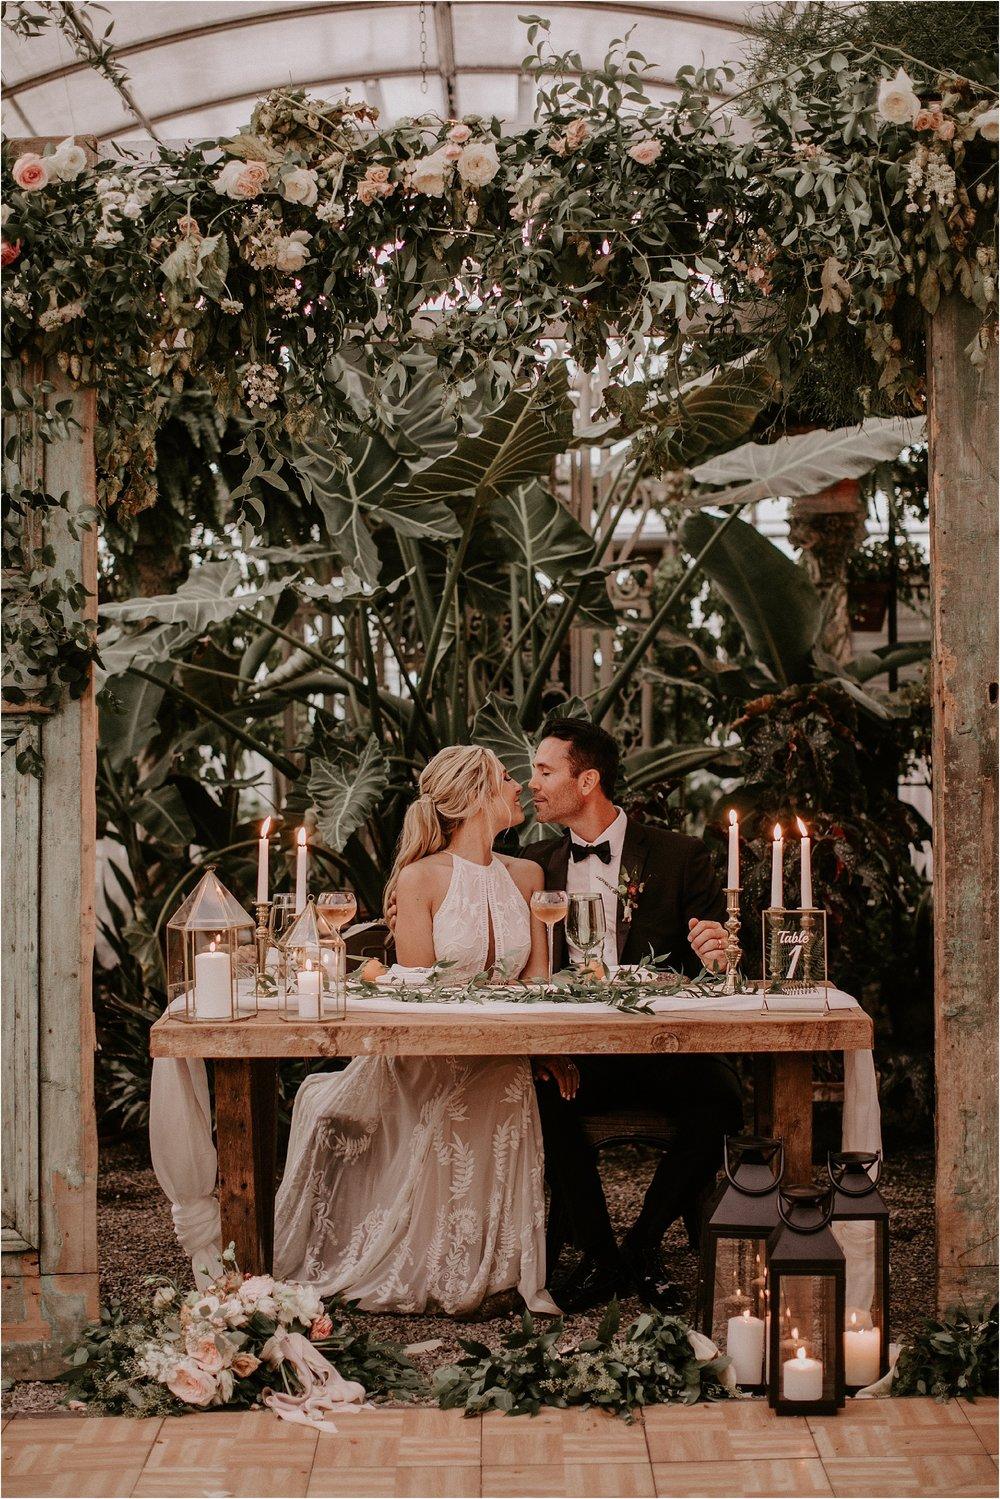 Sarah_Brookhart_Hortulus_Farm_Garden_and_Nursey_Wedding_Photographer_0069.jpg